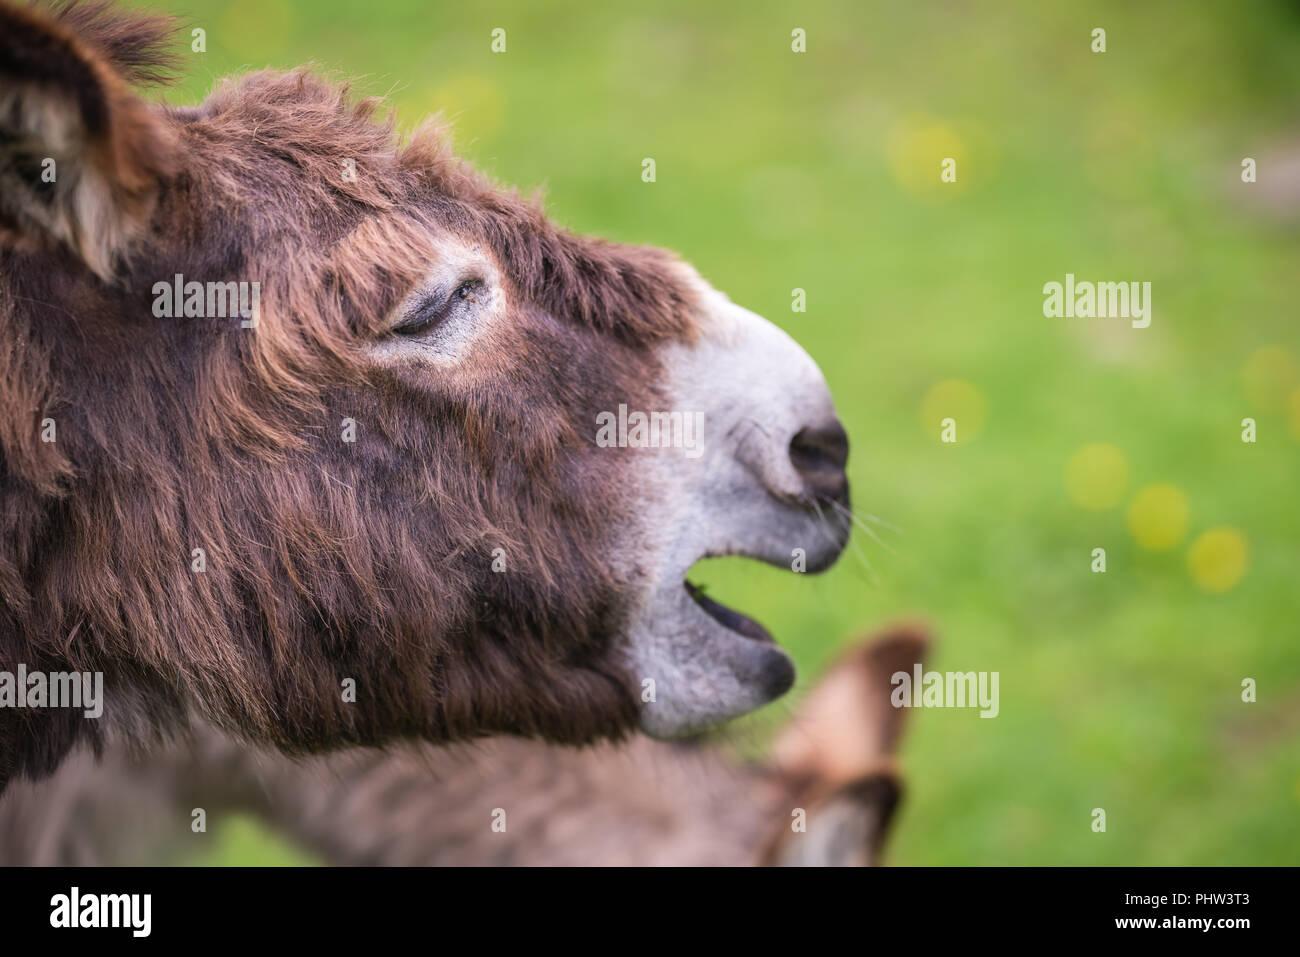 Grand âne poilu criant bruyamment Photo Stock